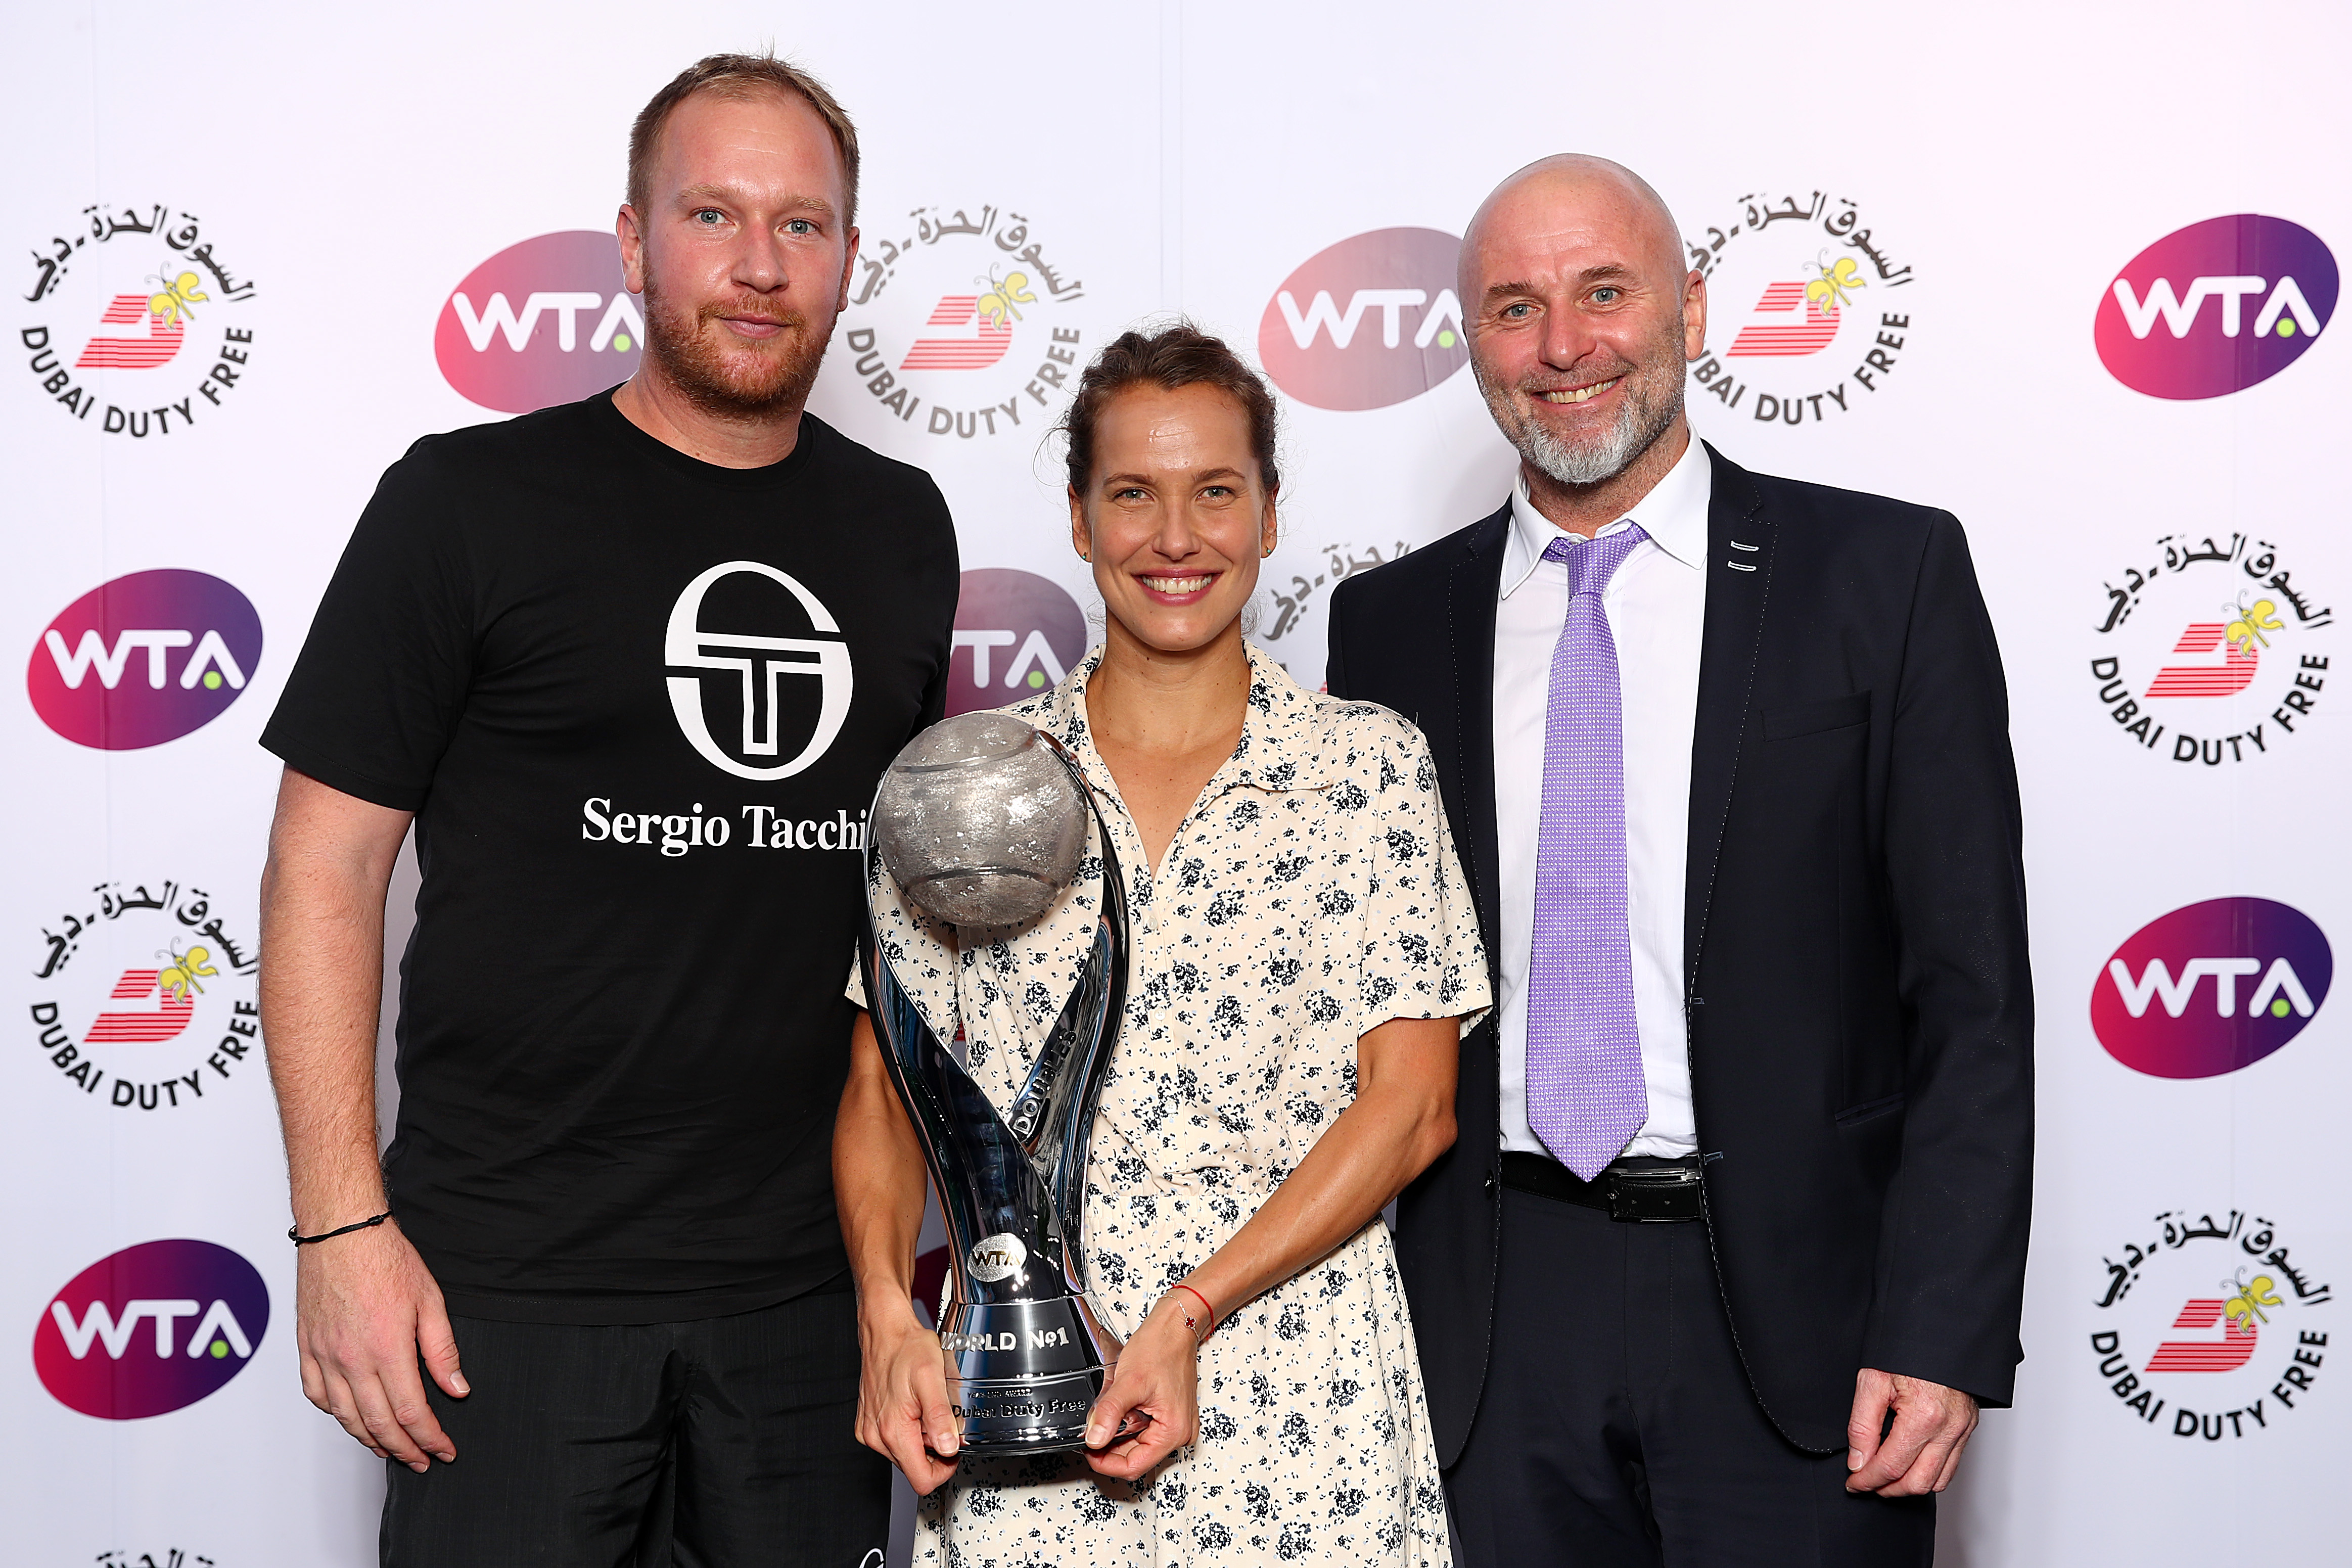 Barbora Strycova splits with David Kotyza, ponders retirement plans